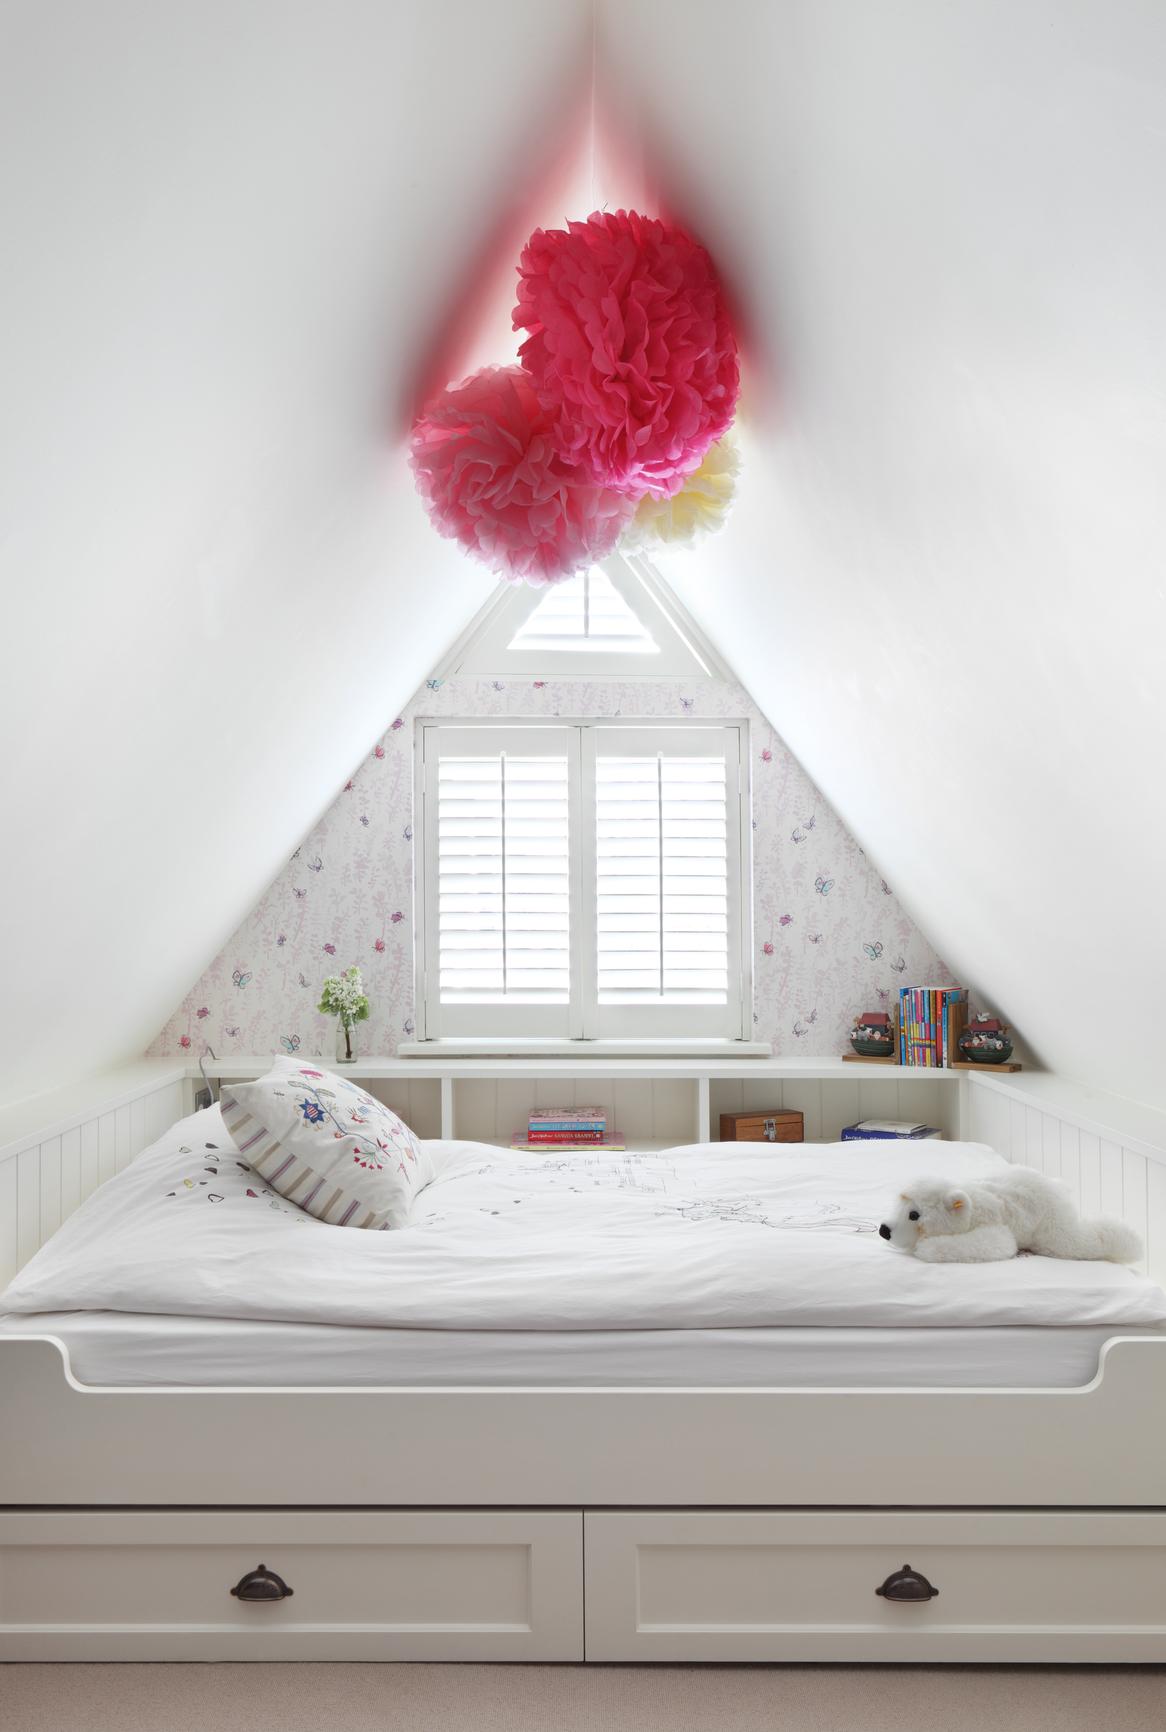 Under eaves bed with pull out truckle bed Interior designer - Turner Pocock